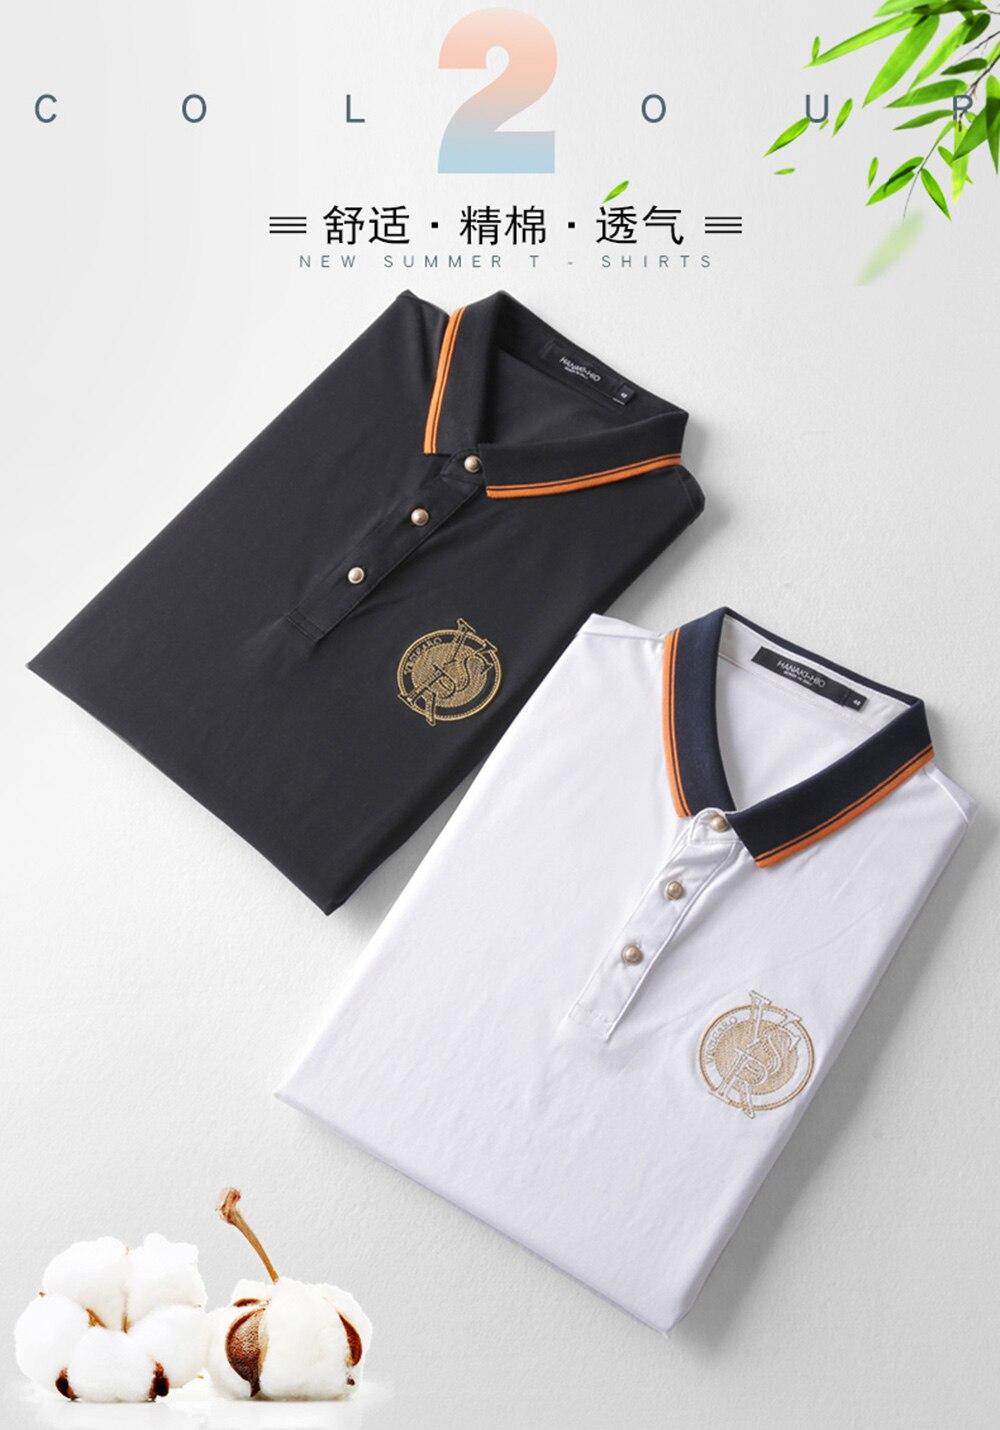 2018 New Arrival Brand Men\'s Summer Business Shirt Short Sleeves Turn-down Collar Polo Shirt Smart Casual pol Shirt Men Shirts (6)